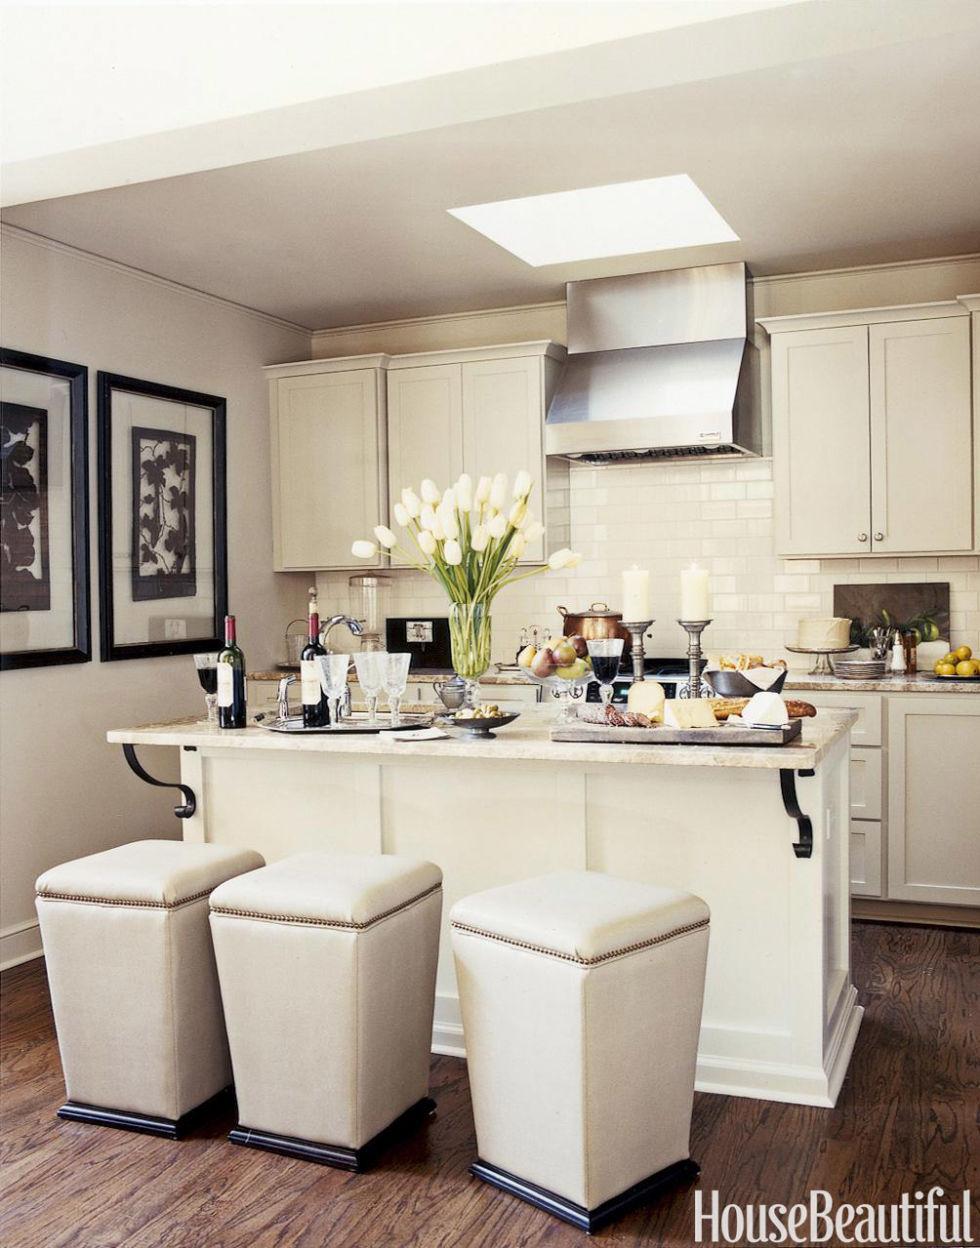 Top Dream Kitchen Designs Pictures Of Dream Kitchens Magic Designer Kitchens  With Kitchen Magic. Part 61